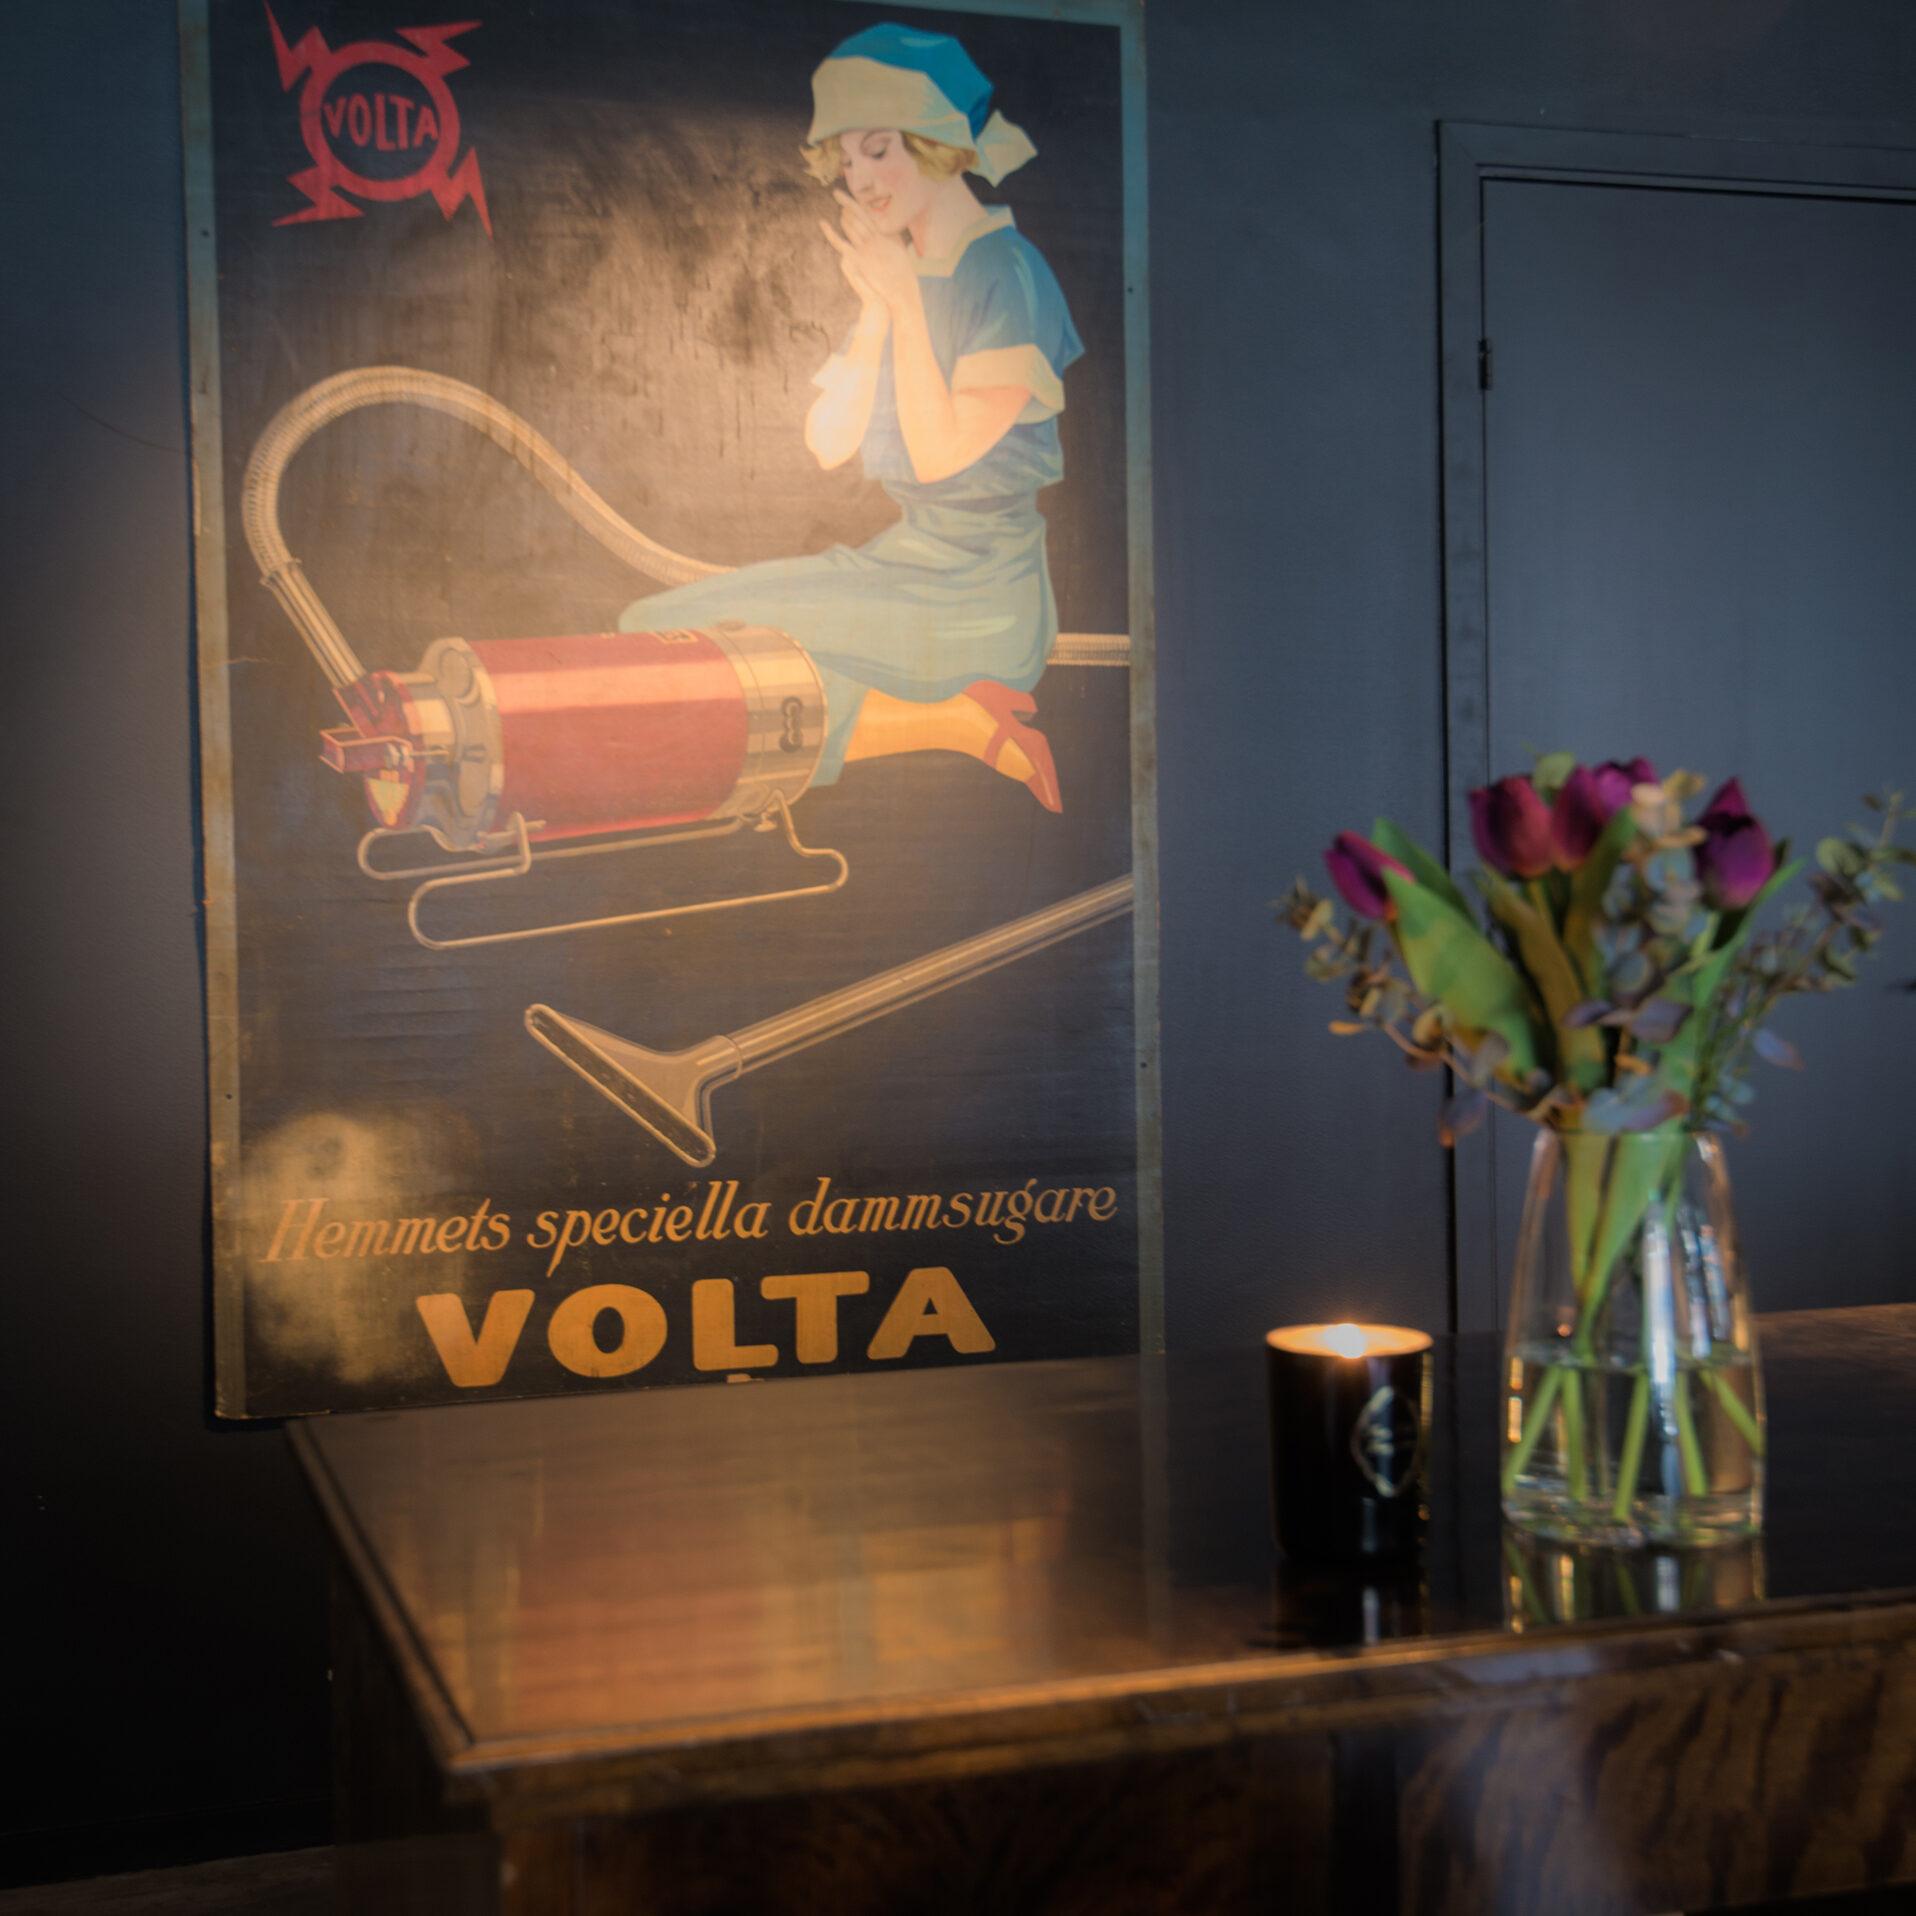 Botell Volta Lobby